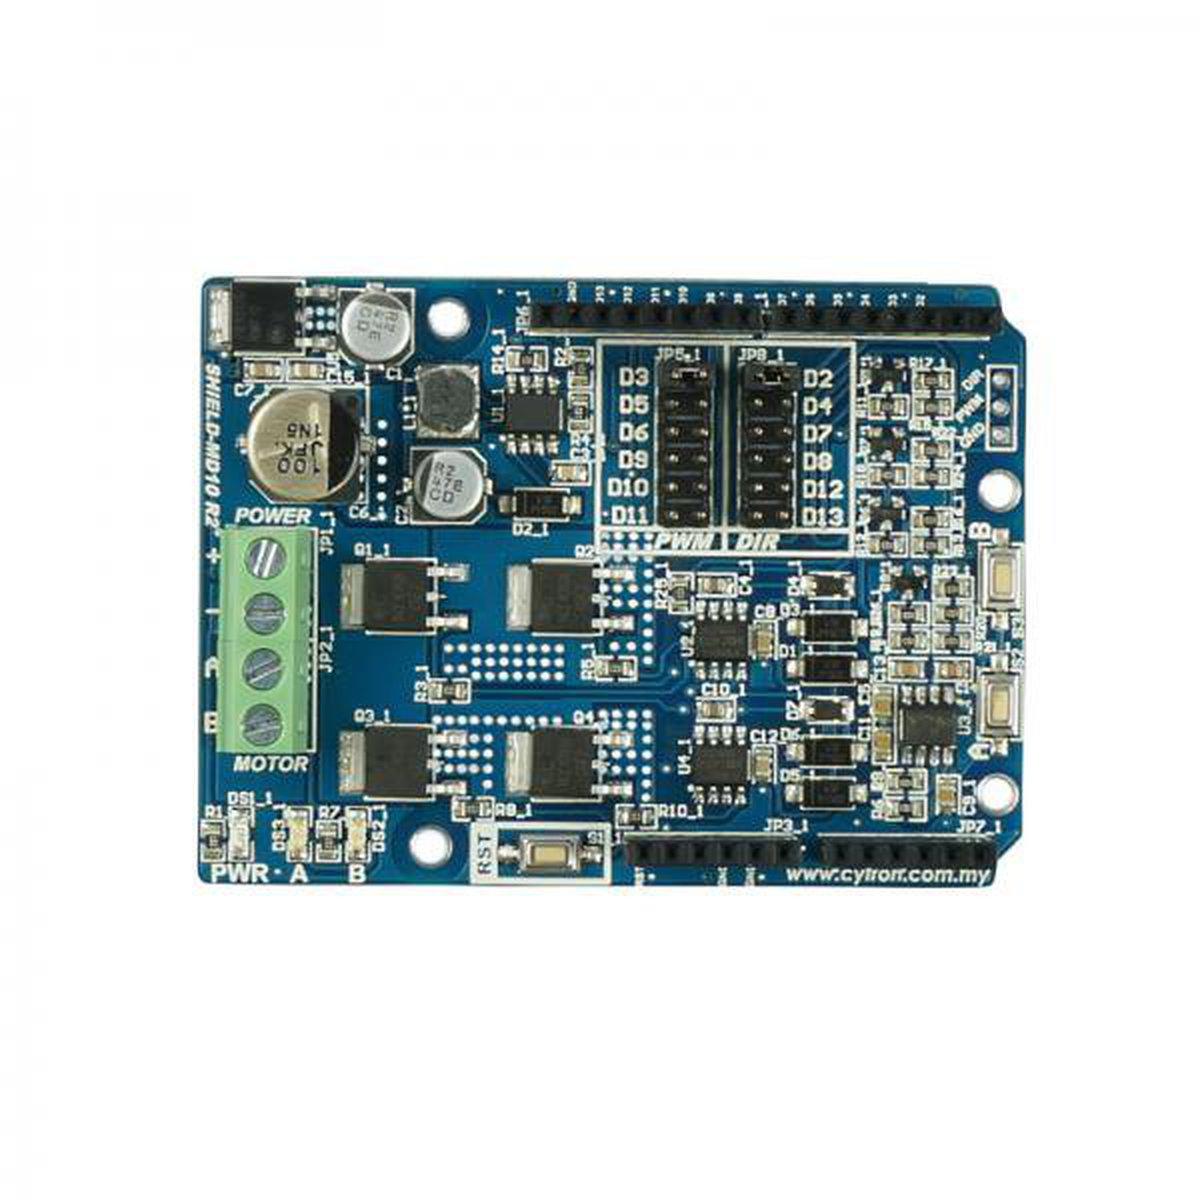 Cytron 10A Motor Driver Shield (Arduino) from Cytron Technologies on